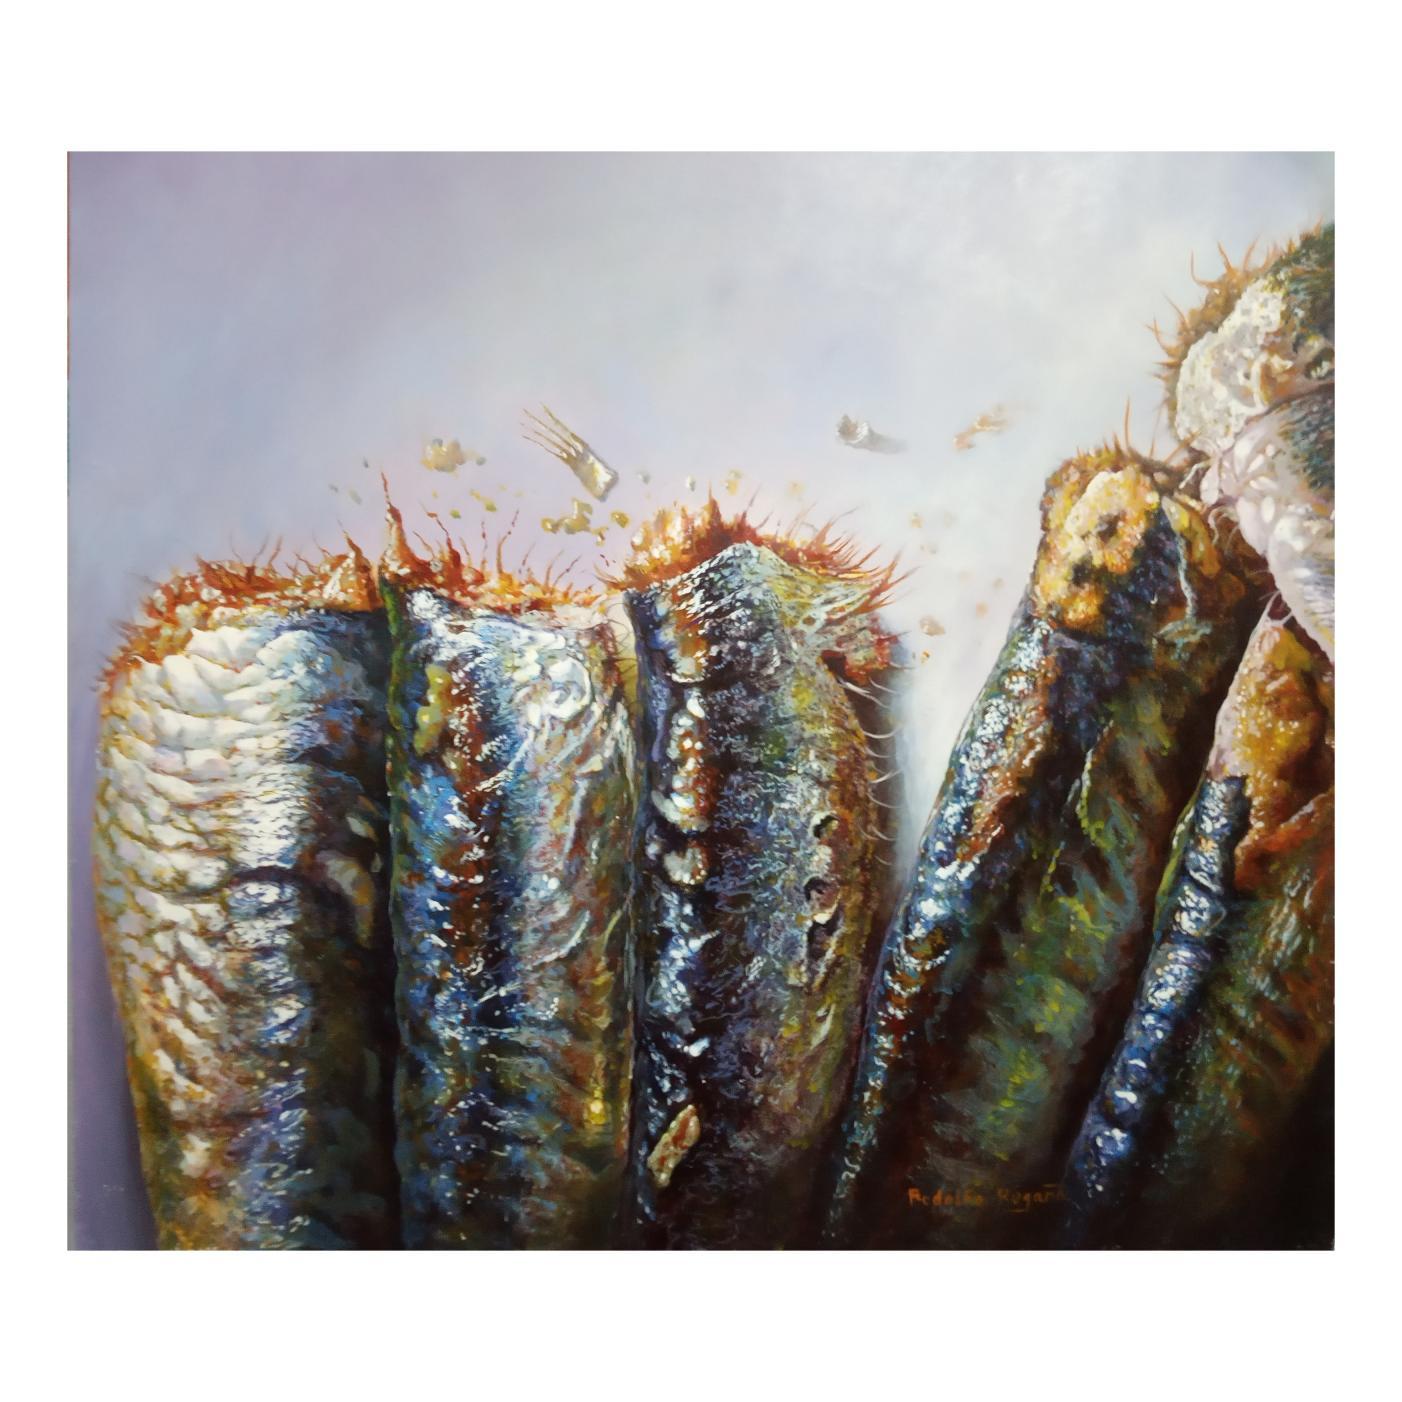 Sardinas fritas (2020) - Rodolfo Rodríguez Regaño - Rodolfo Regaño